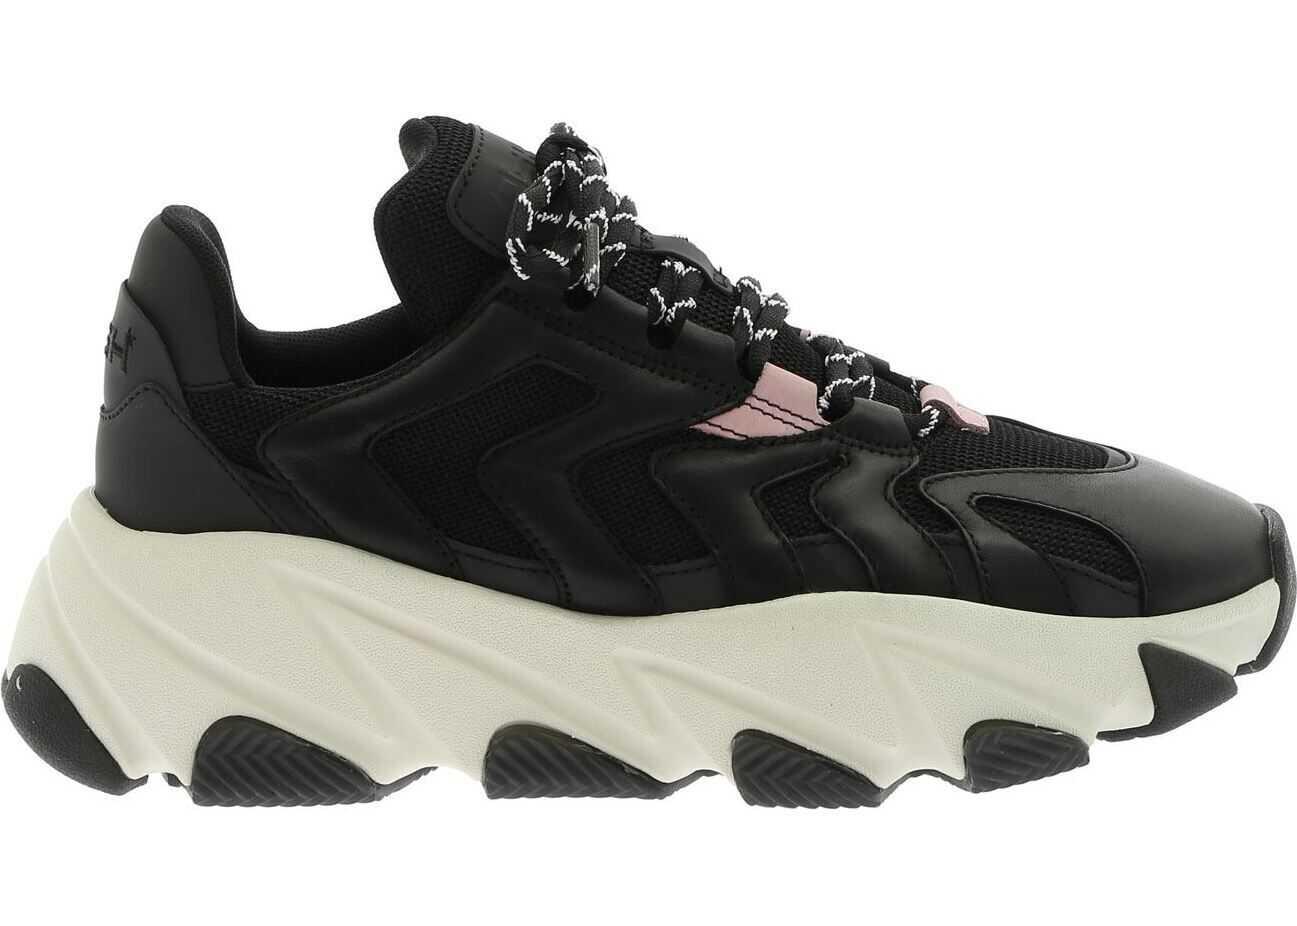 ASH Extreme Sneakers In Black Black